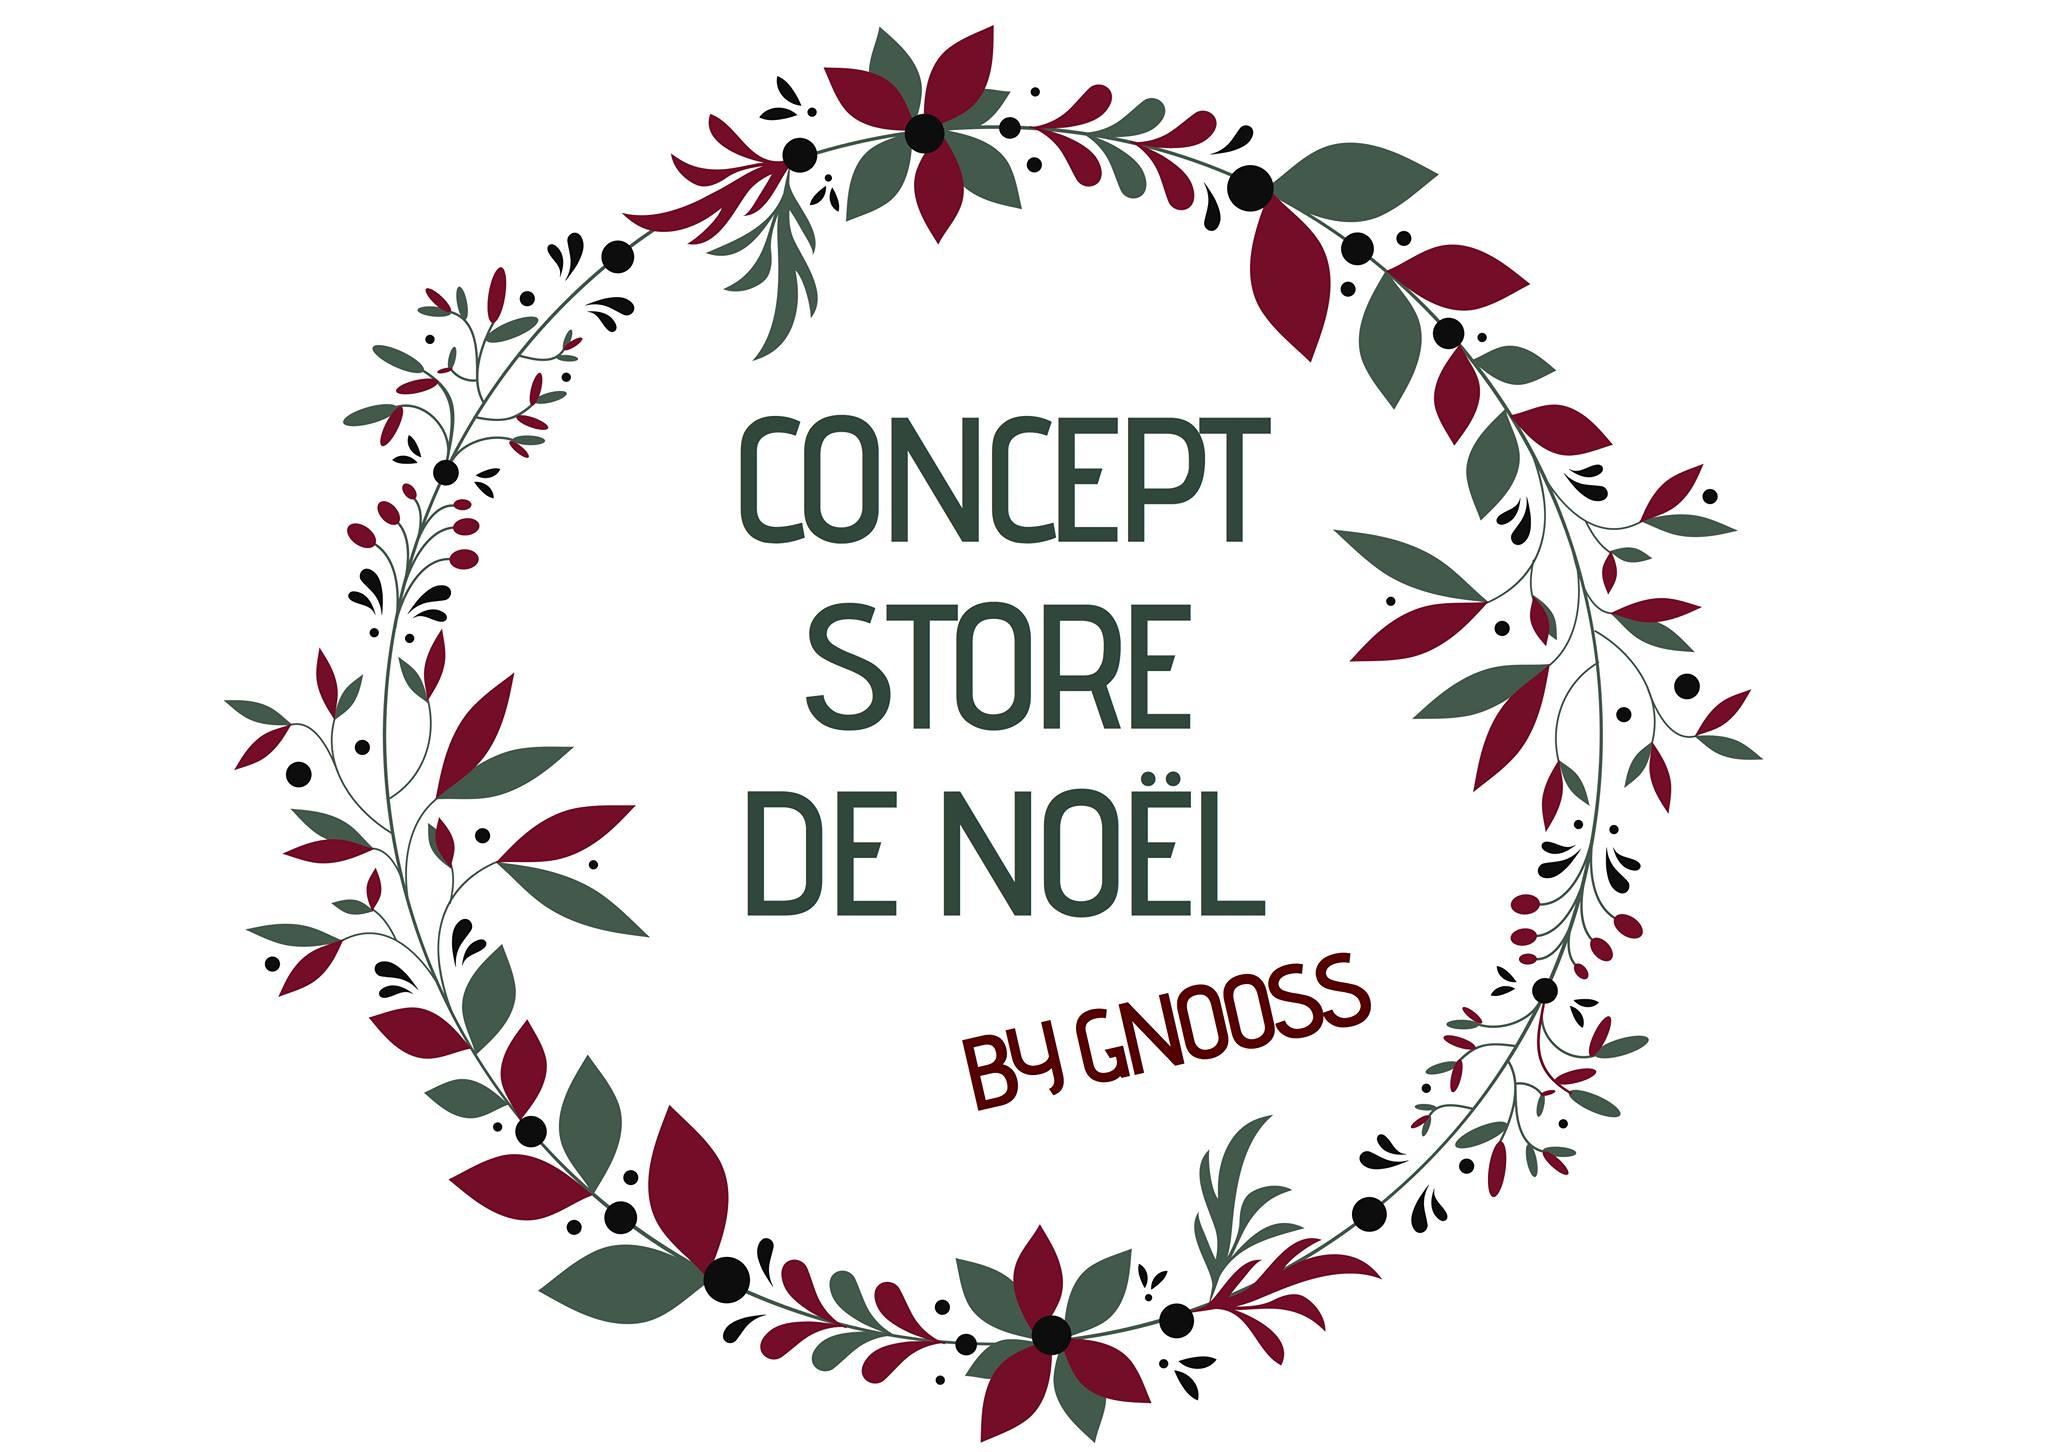 Concept Store de Noël Strasbourg Broderie